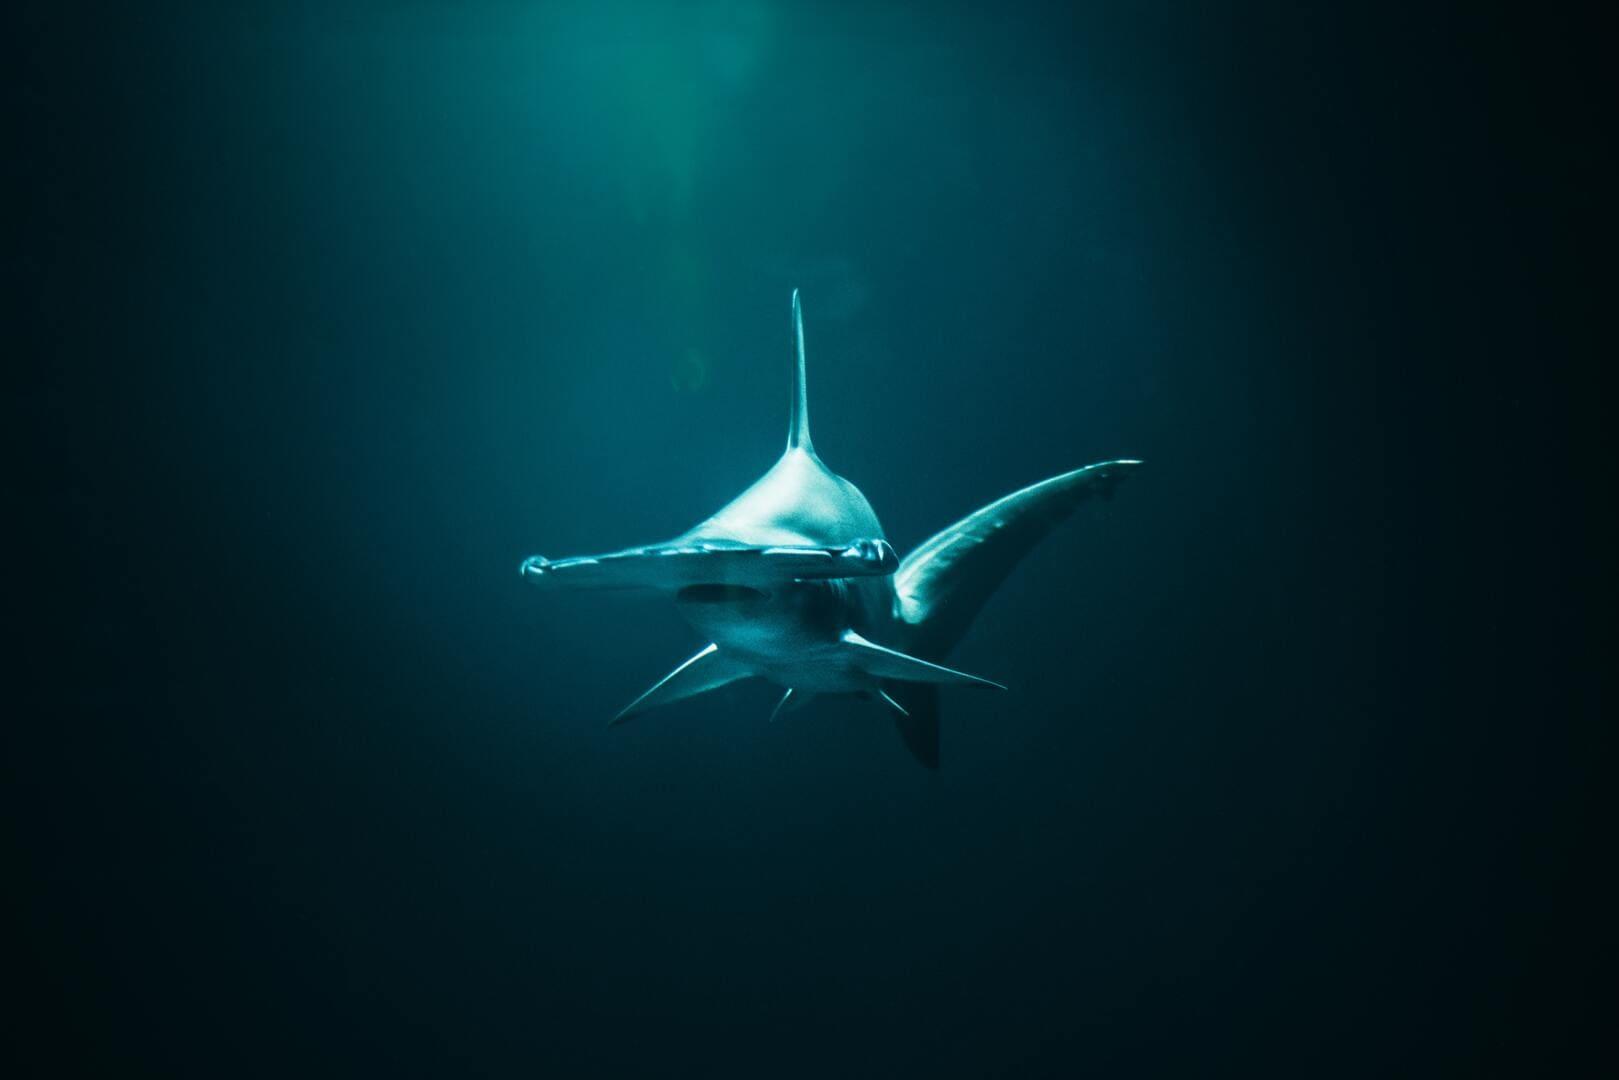 A hammerhead shark in the blue waters of Tubbataha Reefs Natural Park